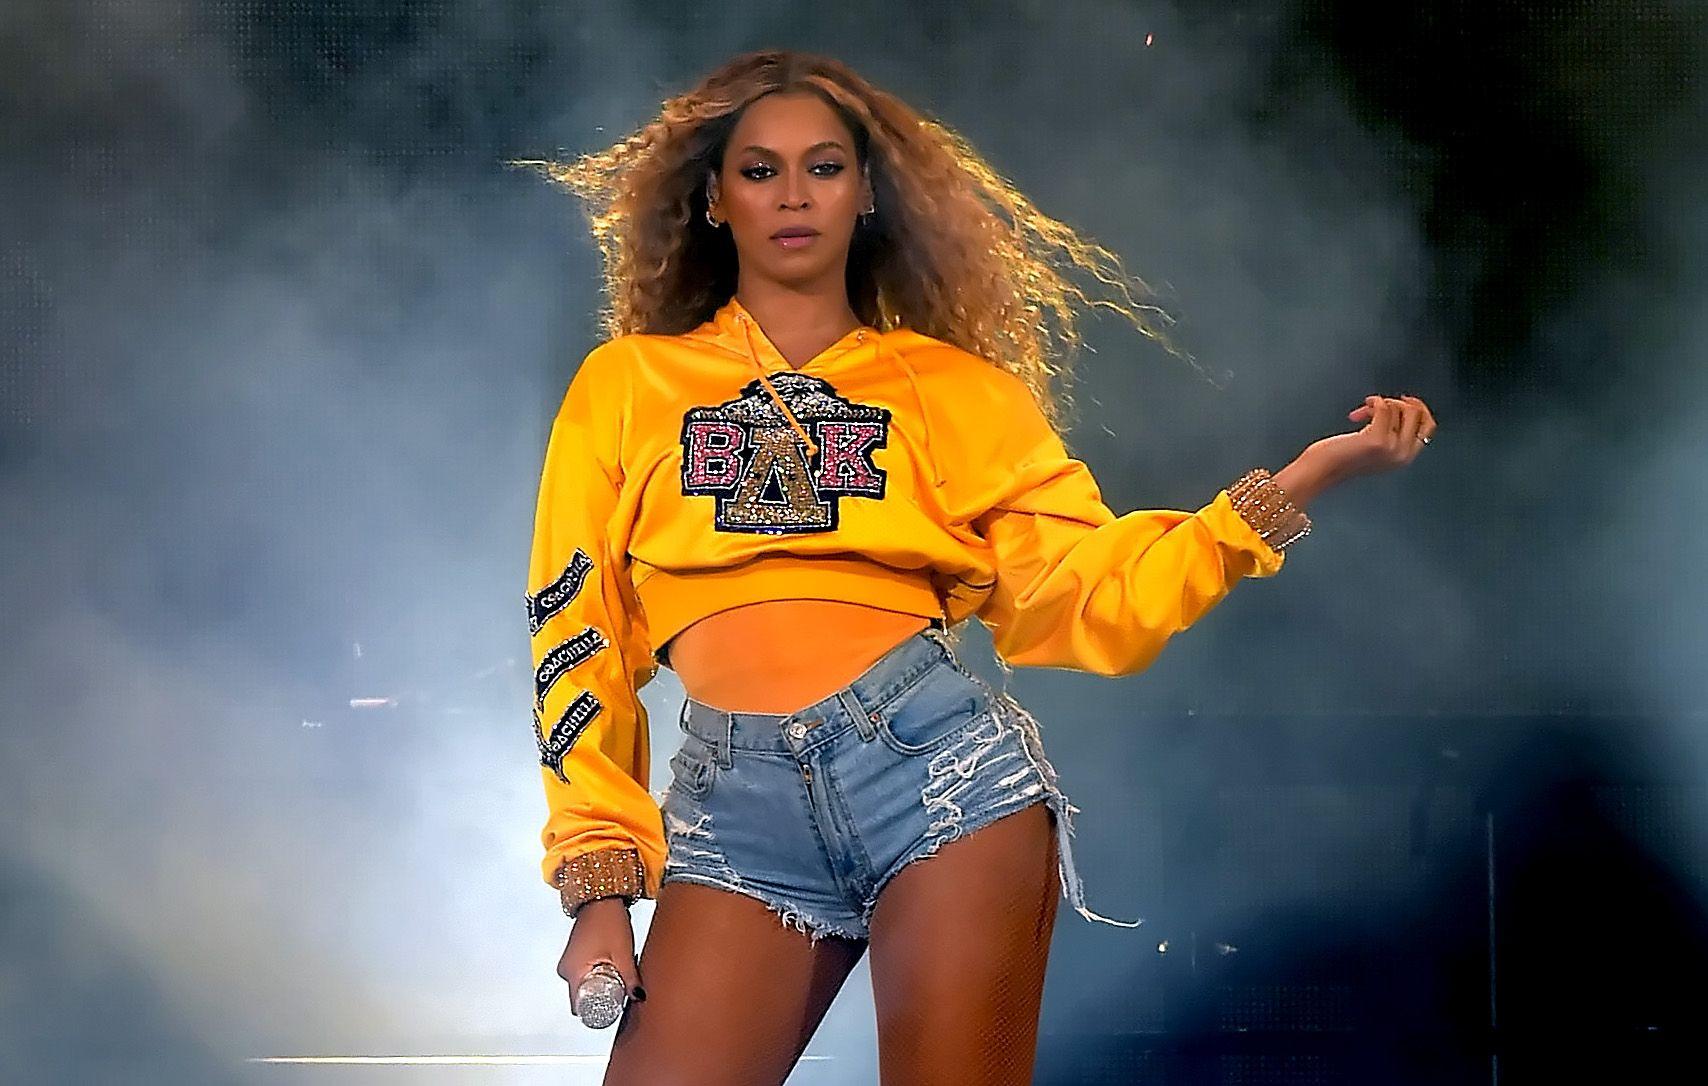 Beyonce dating lijst leuke feiten over online dating